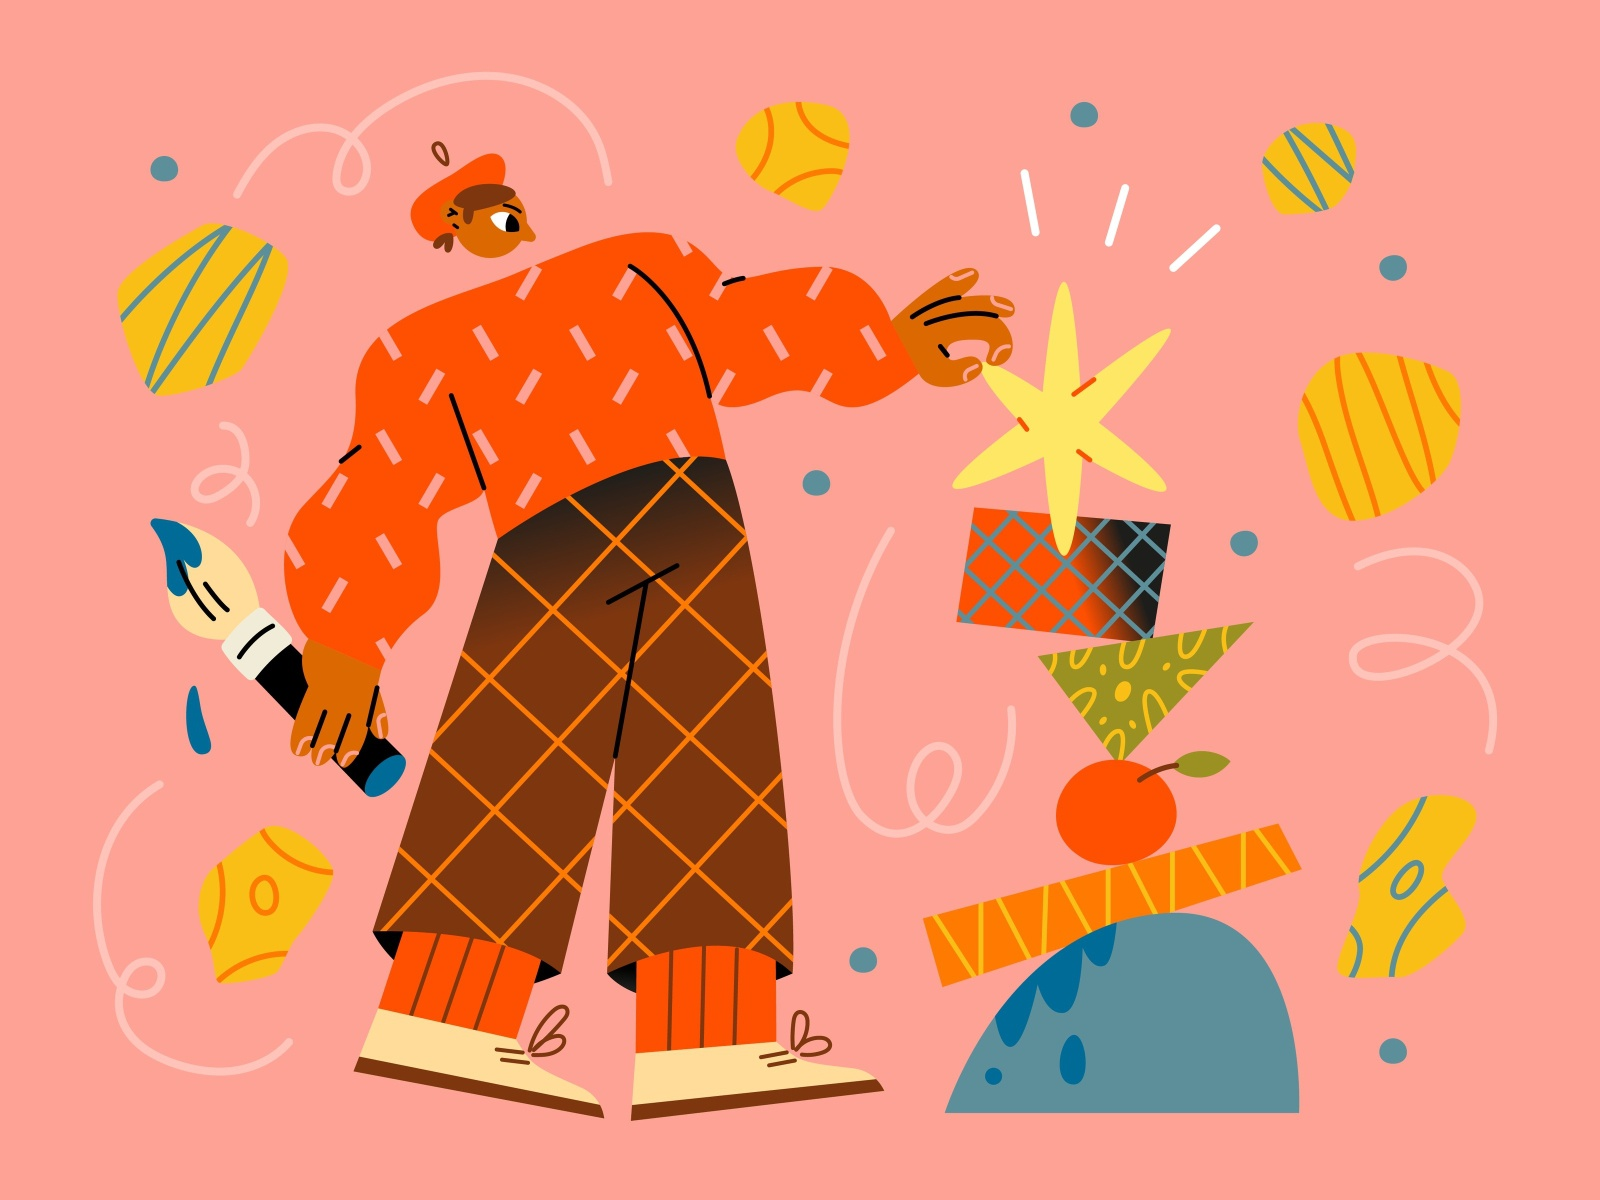 Jose Illustration Pack